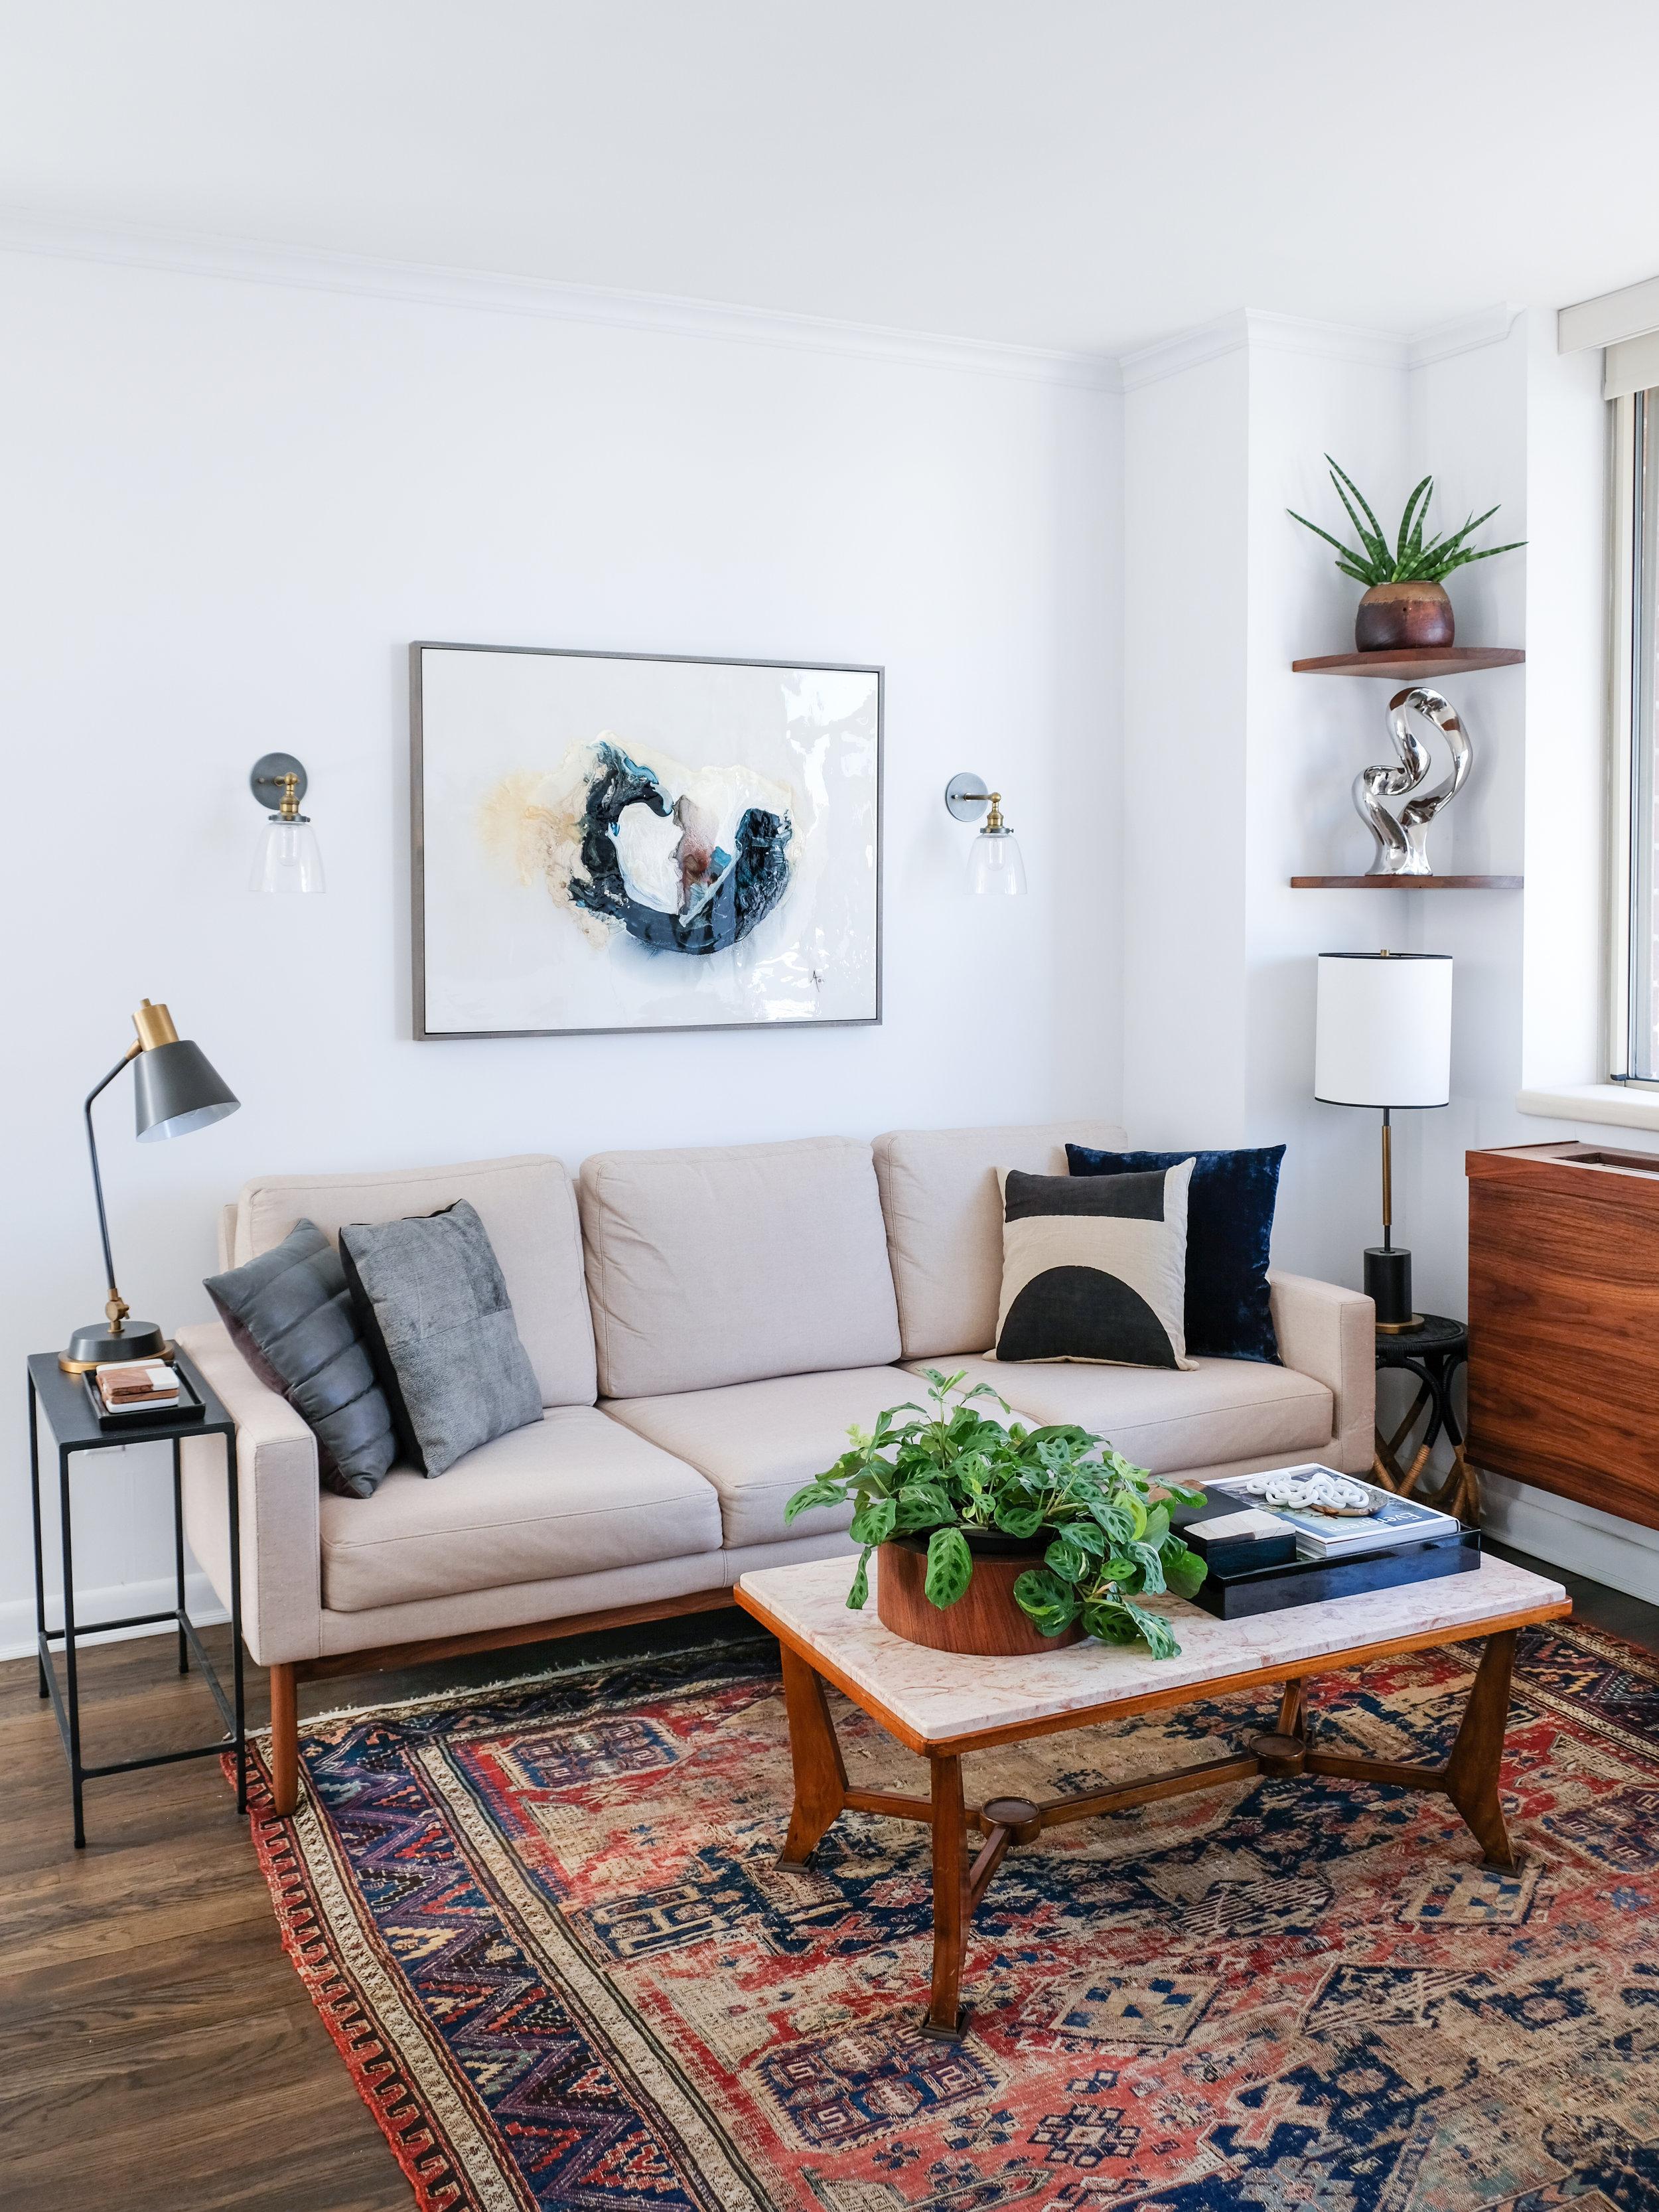 My favorite corner of the apartment.